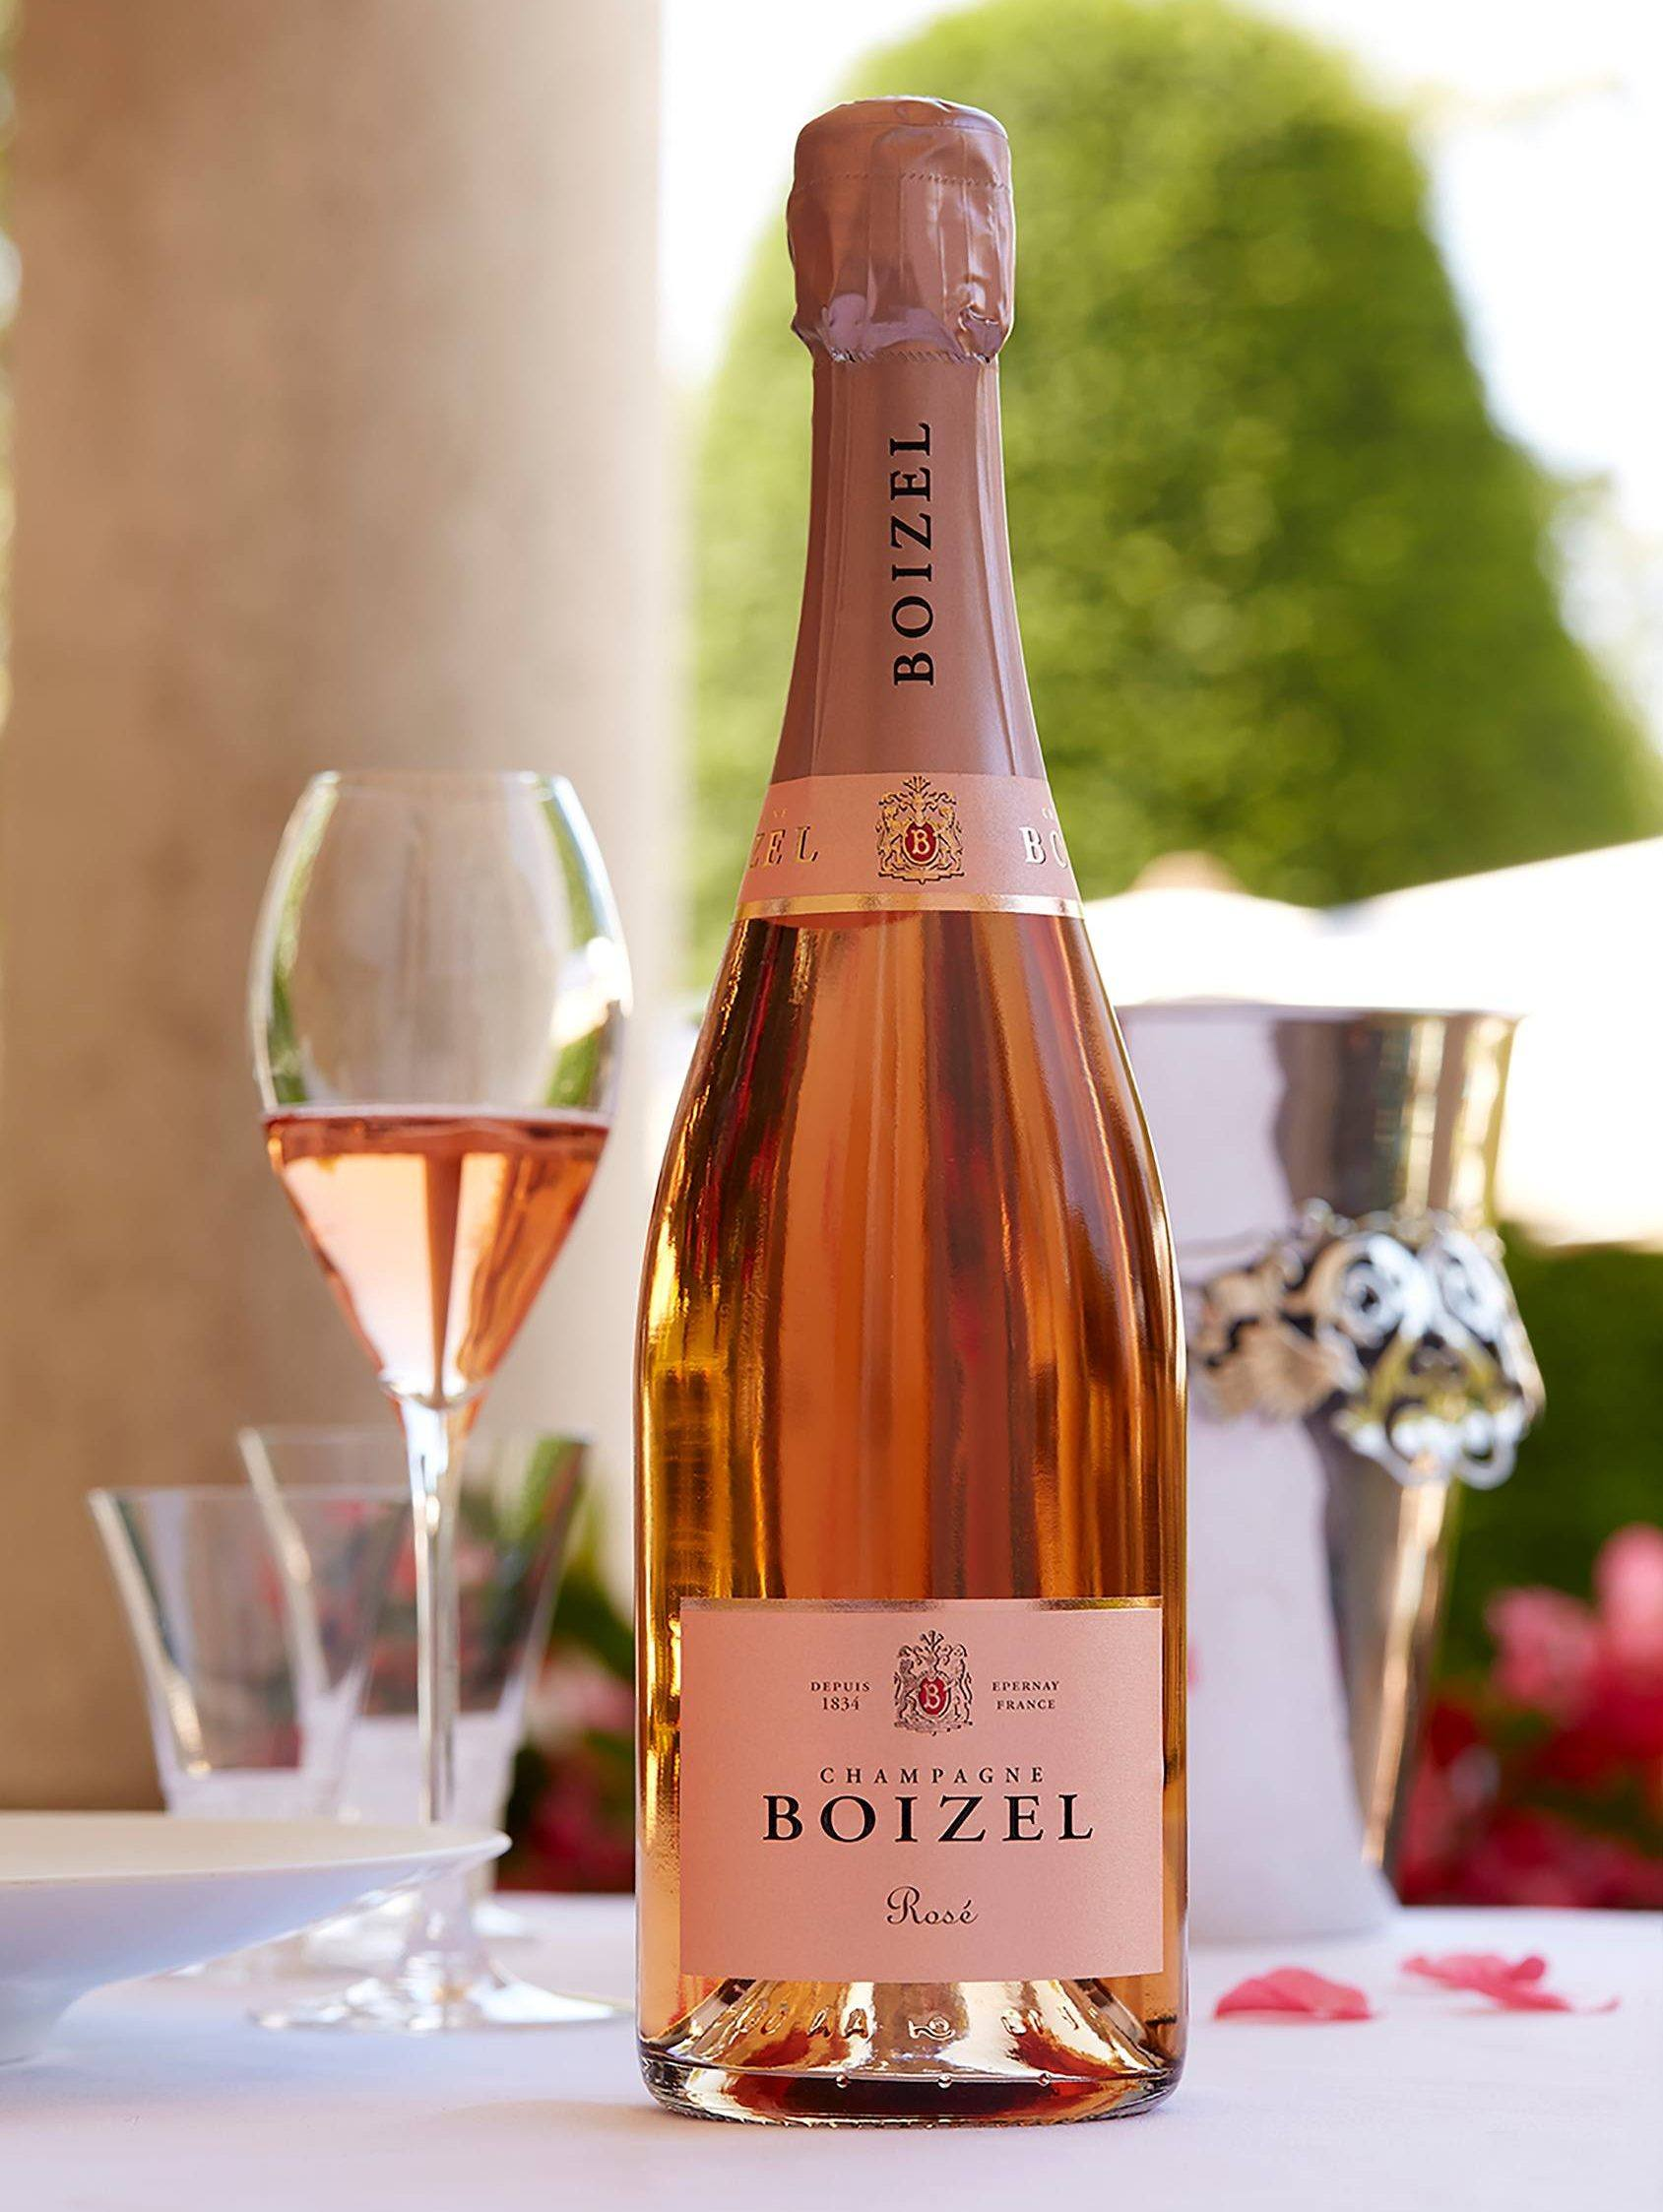 Rosé - Champagne Boizel - Epernay France